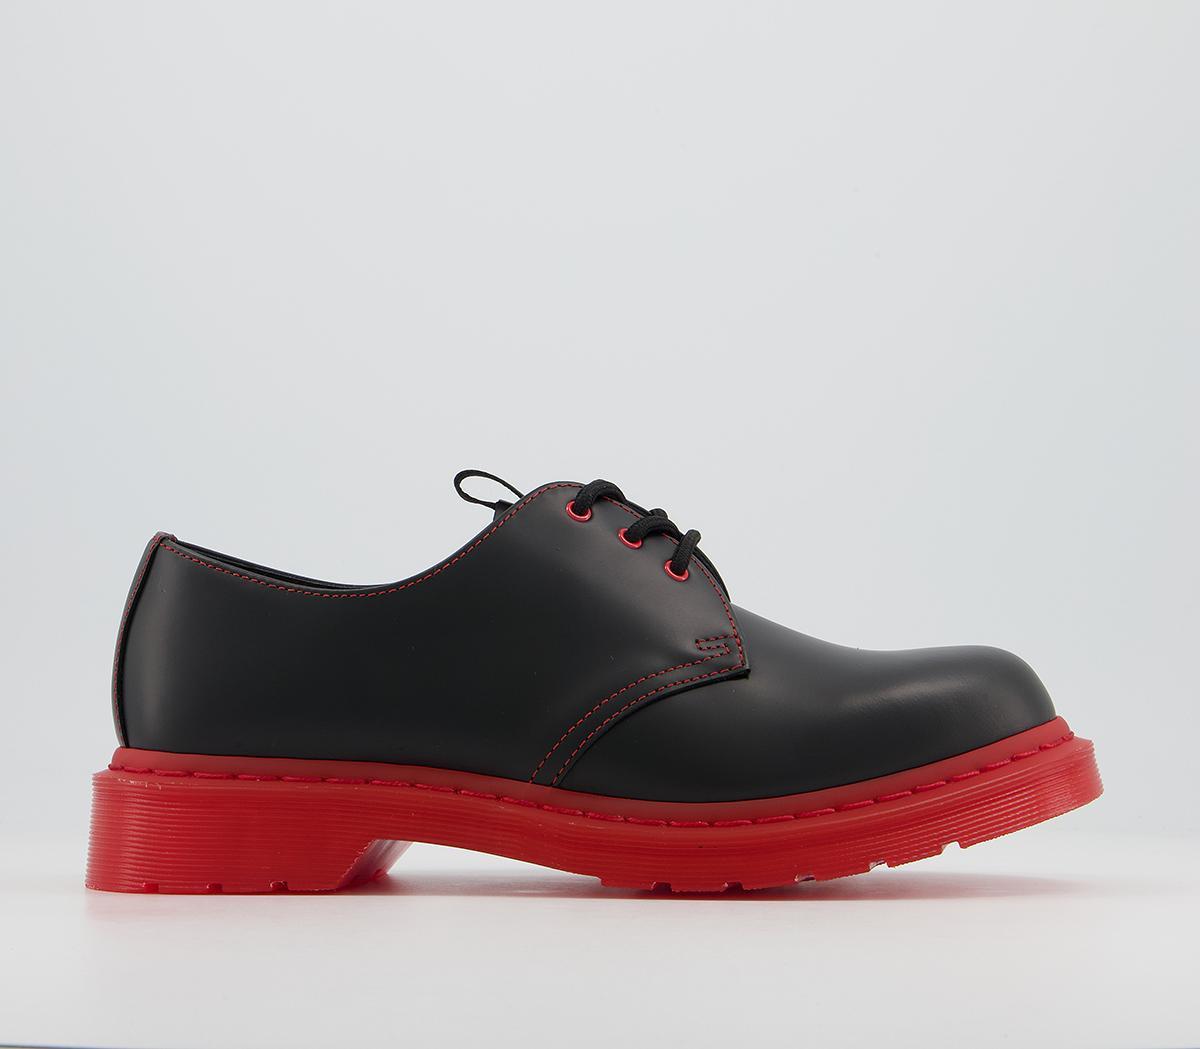 1461 Clot Shoes